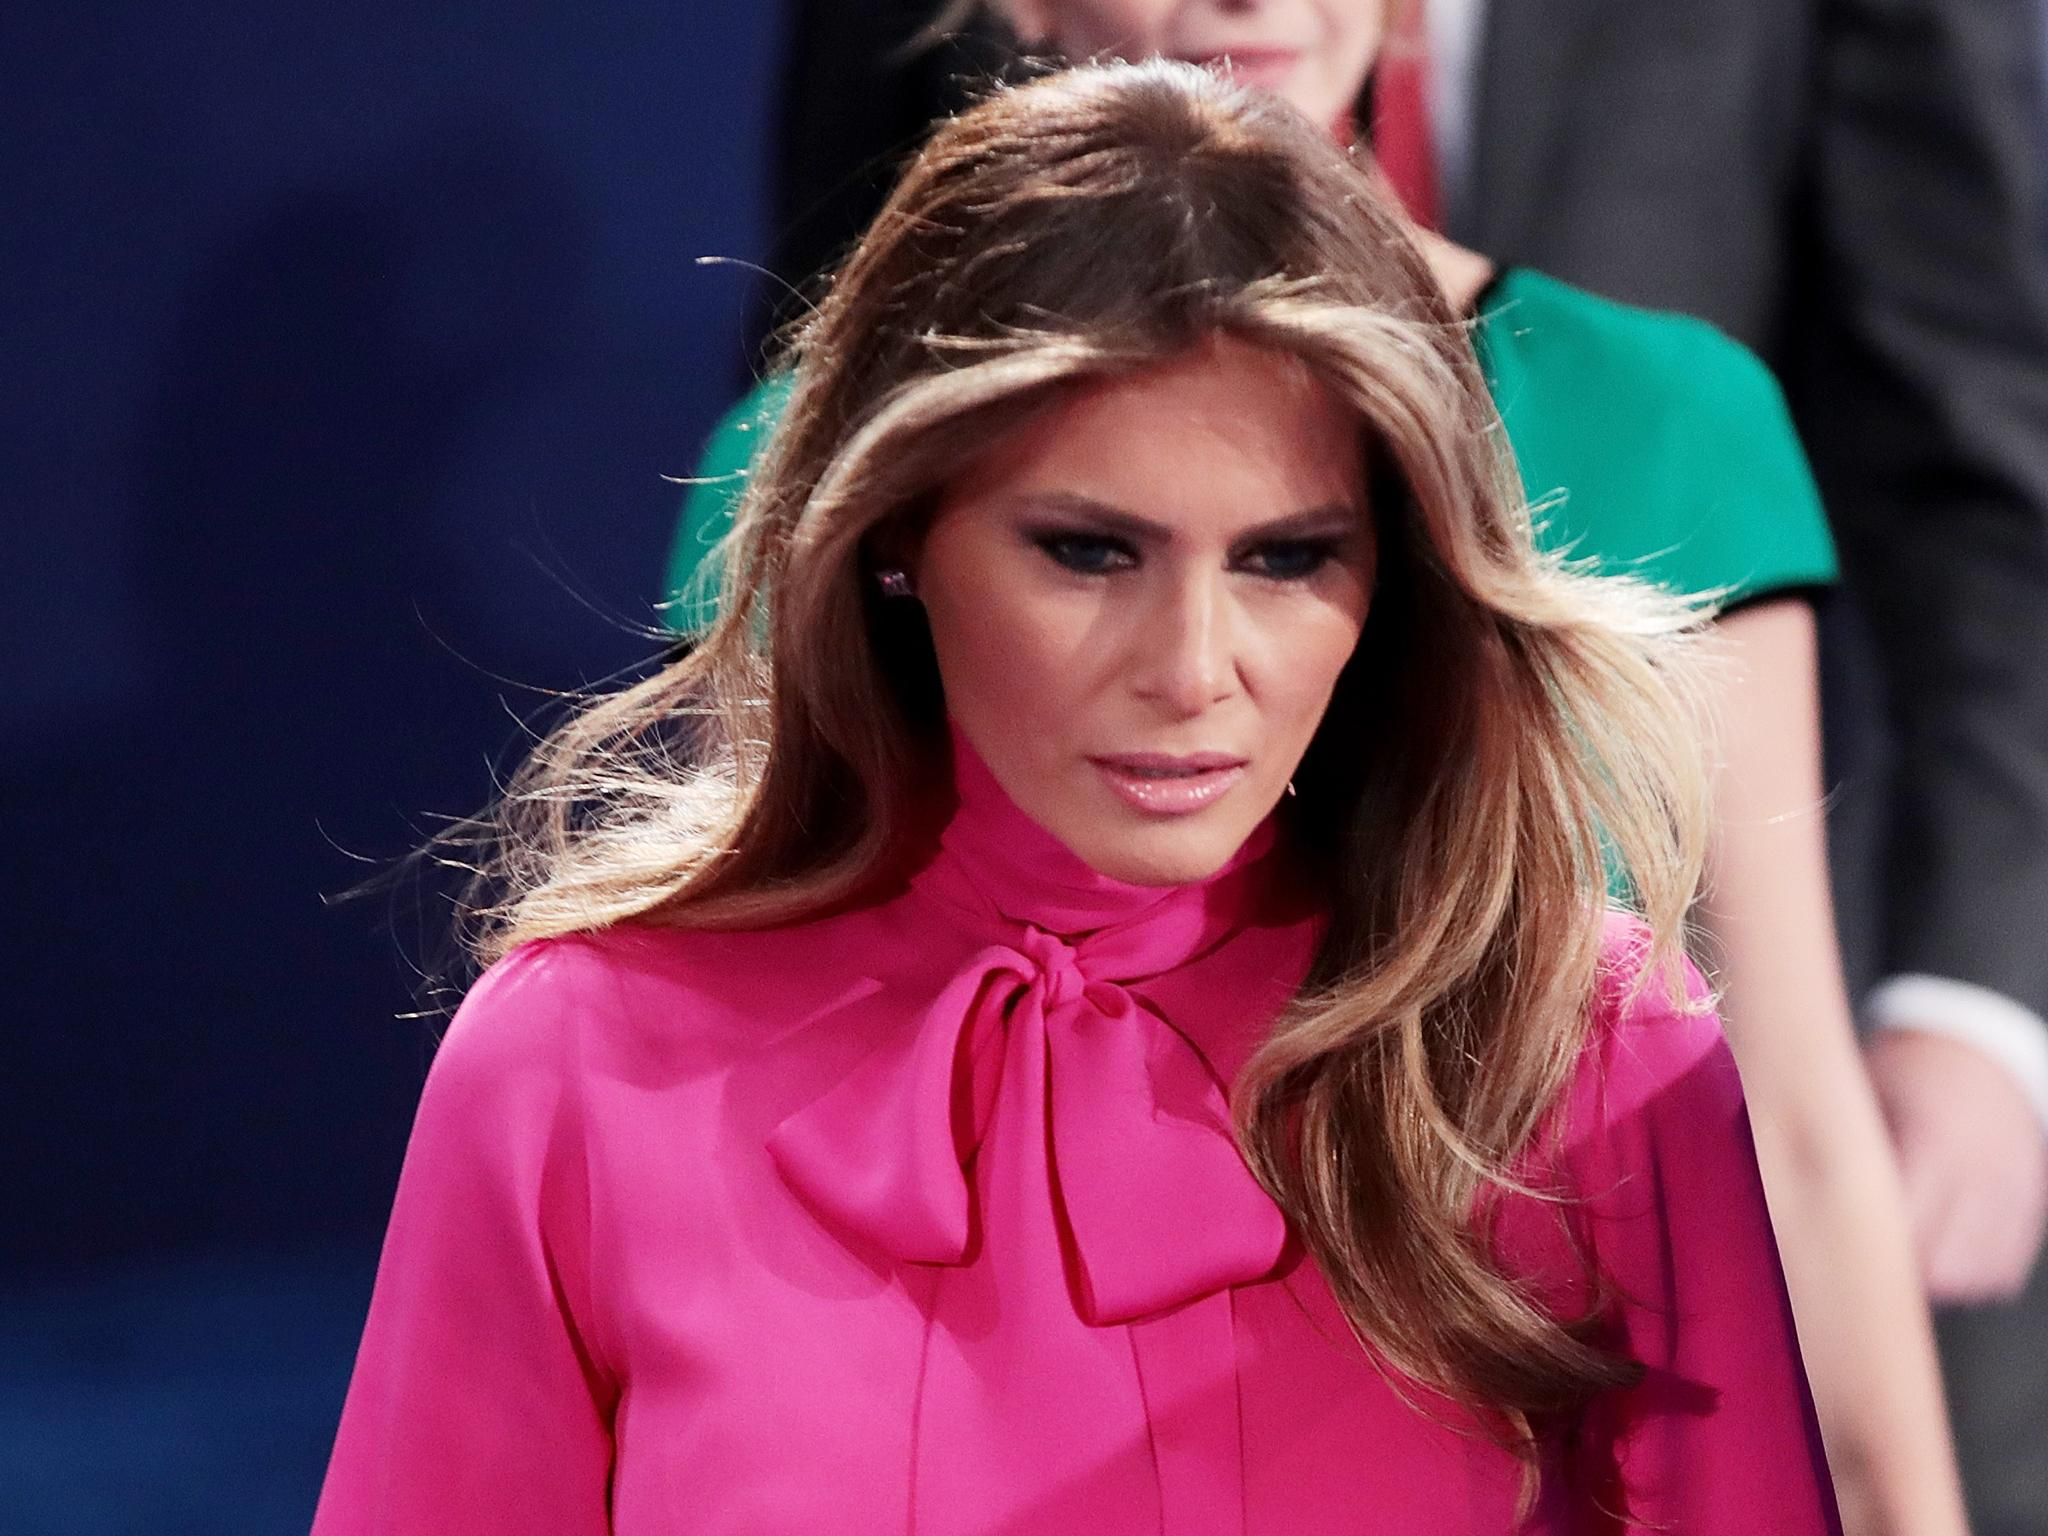 Melania Trump dismisses Donald Trump's sexual assault comments as 'boys  talk' | The Independent